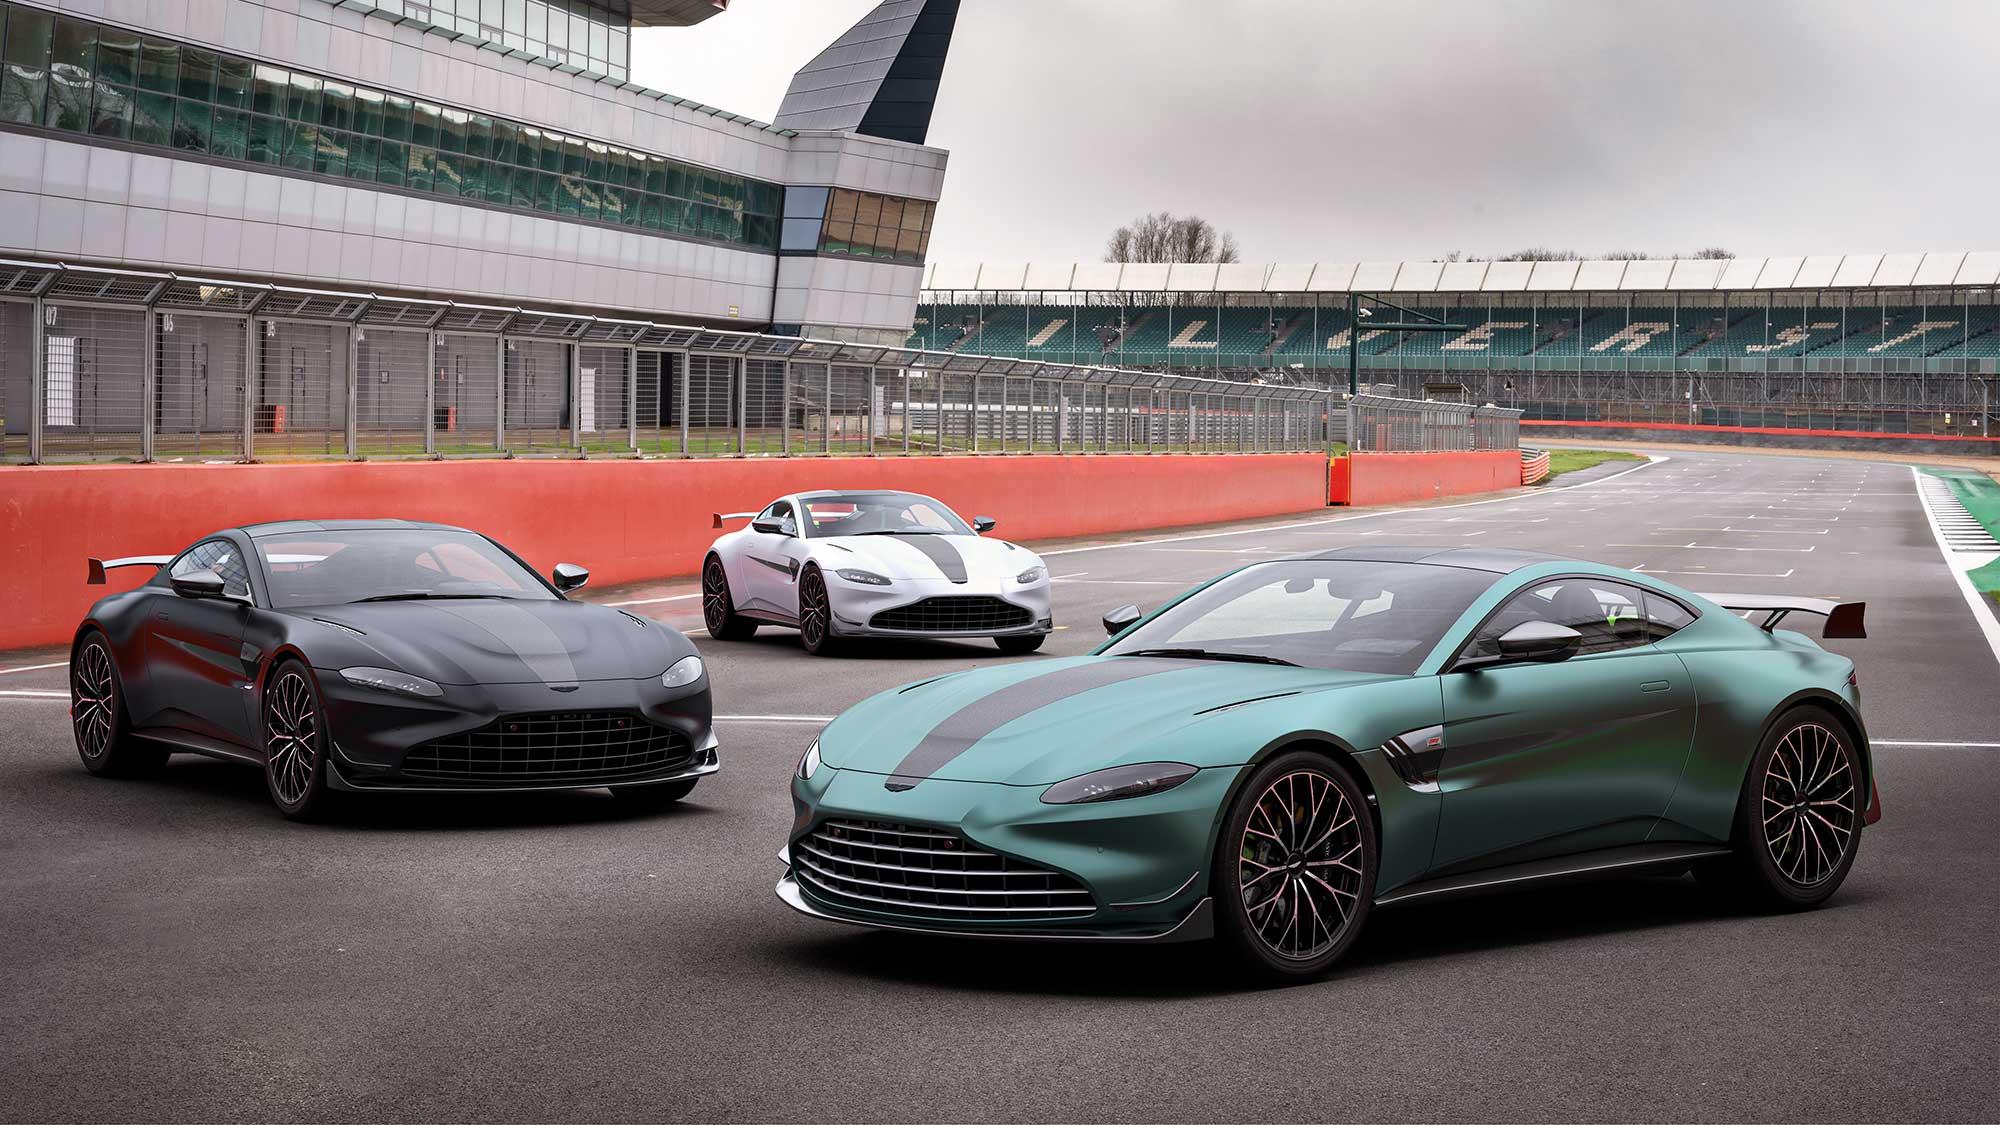 2021 Aston Martin Vantage F1 Edition A Very Powerful Pace Car Money Can Buy Laptrinhx News